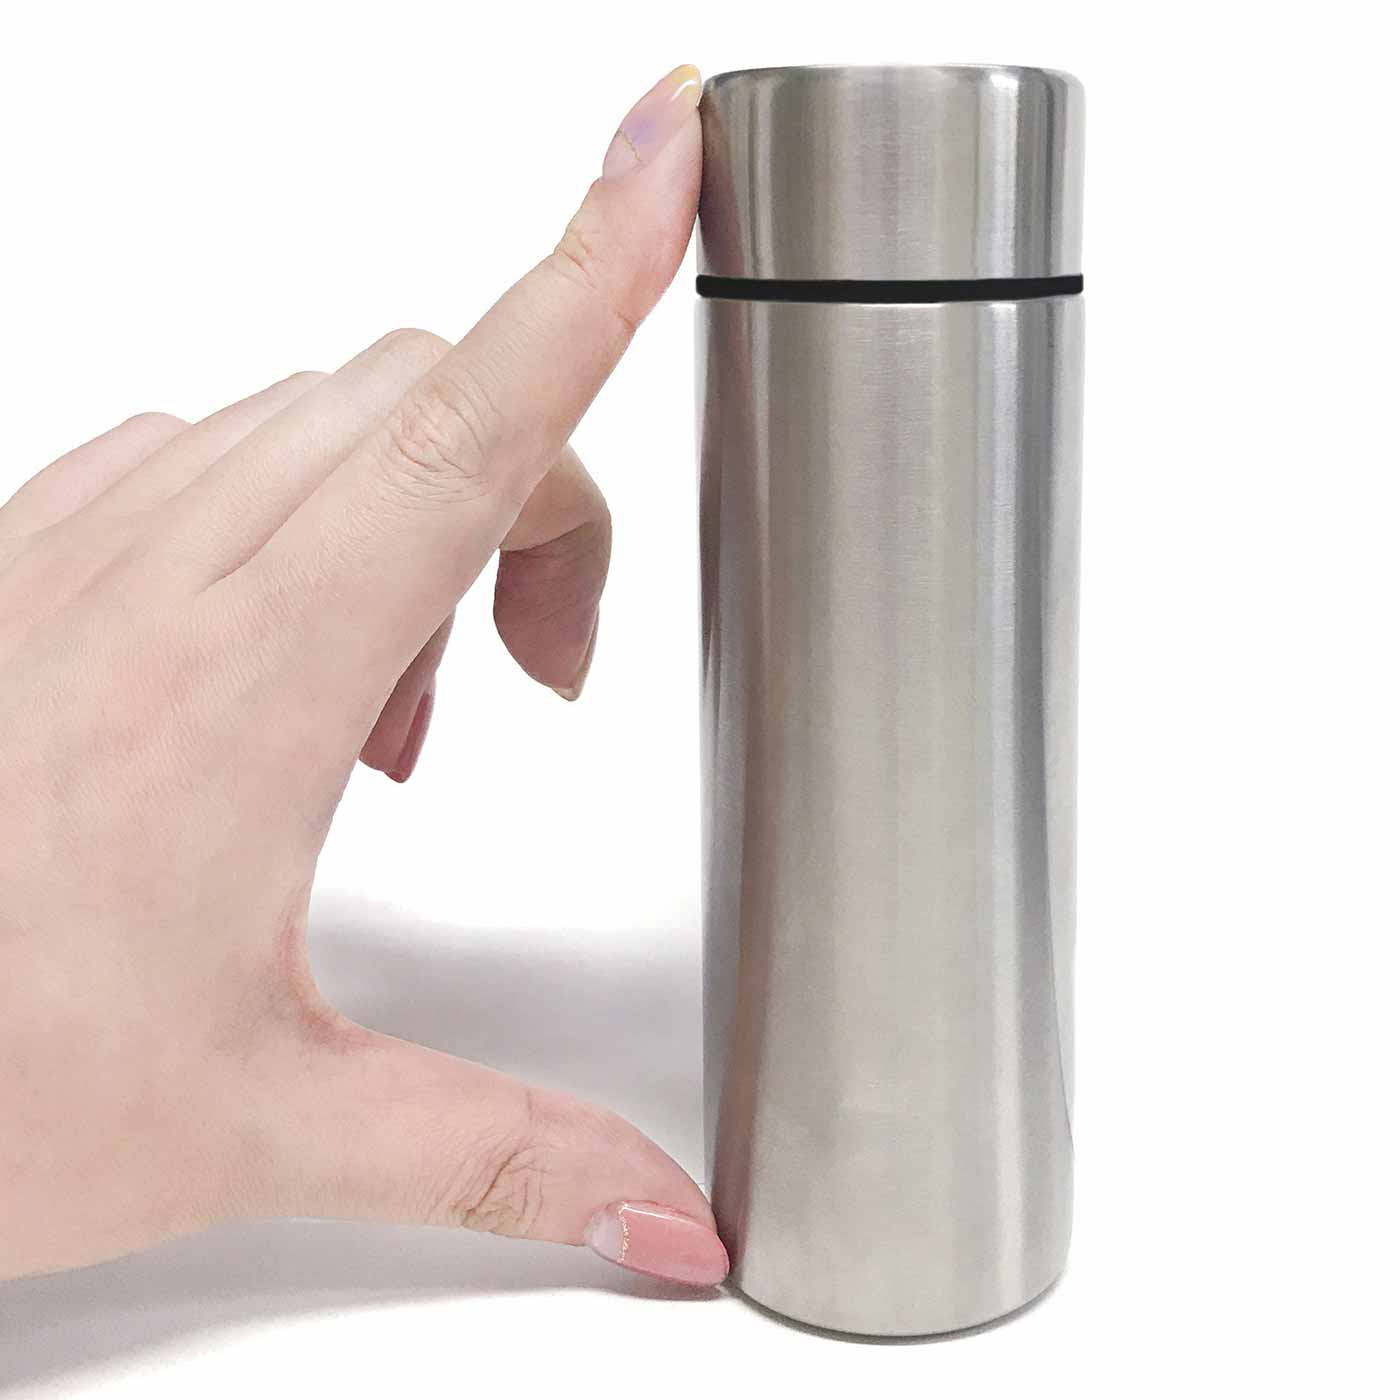 Kraso[クラソ] |ラミプリュス 140mlが意外と便利 気軽に持ち歩ける保温保冷ポケットミニボトルの会|〈ステンレス〉